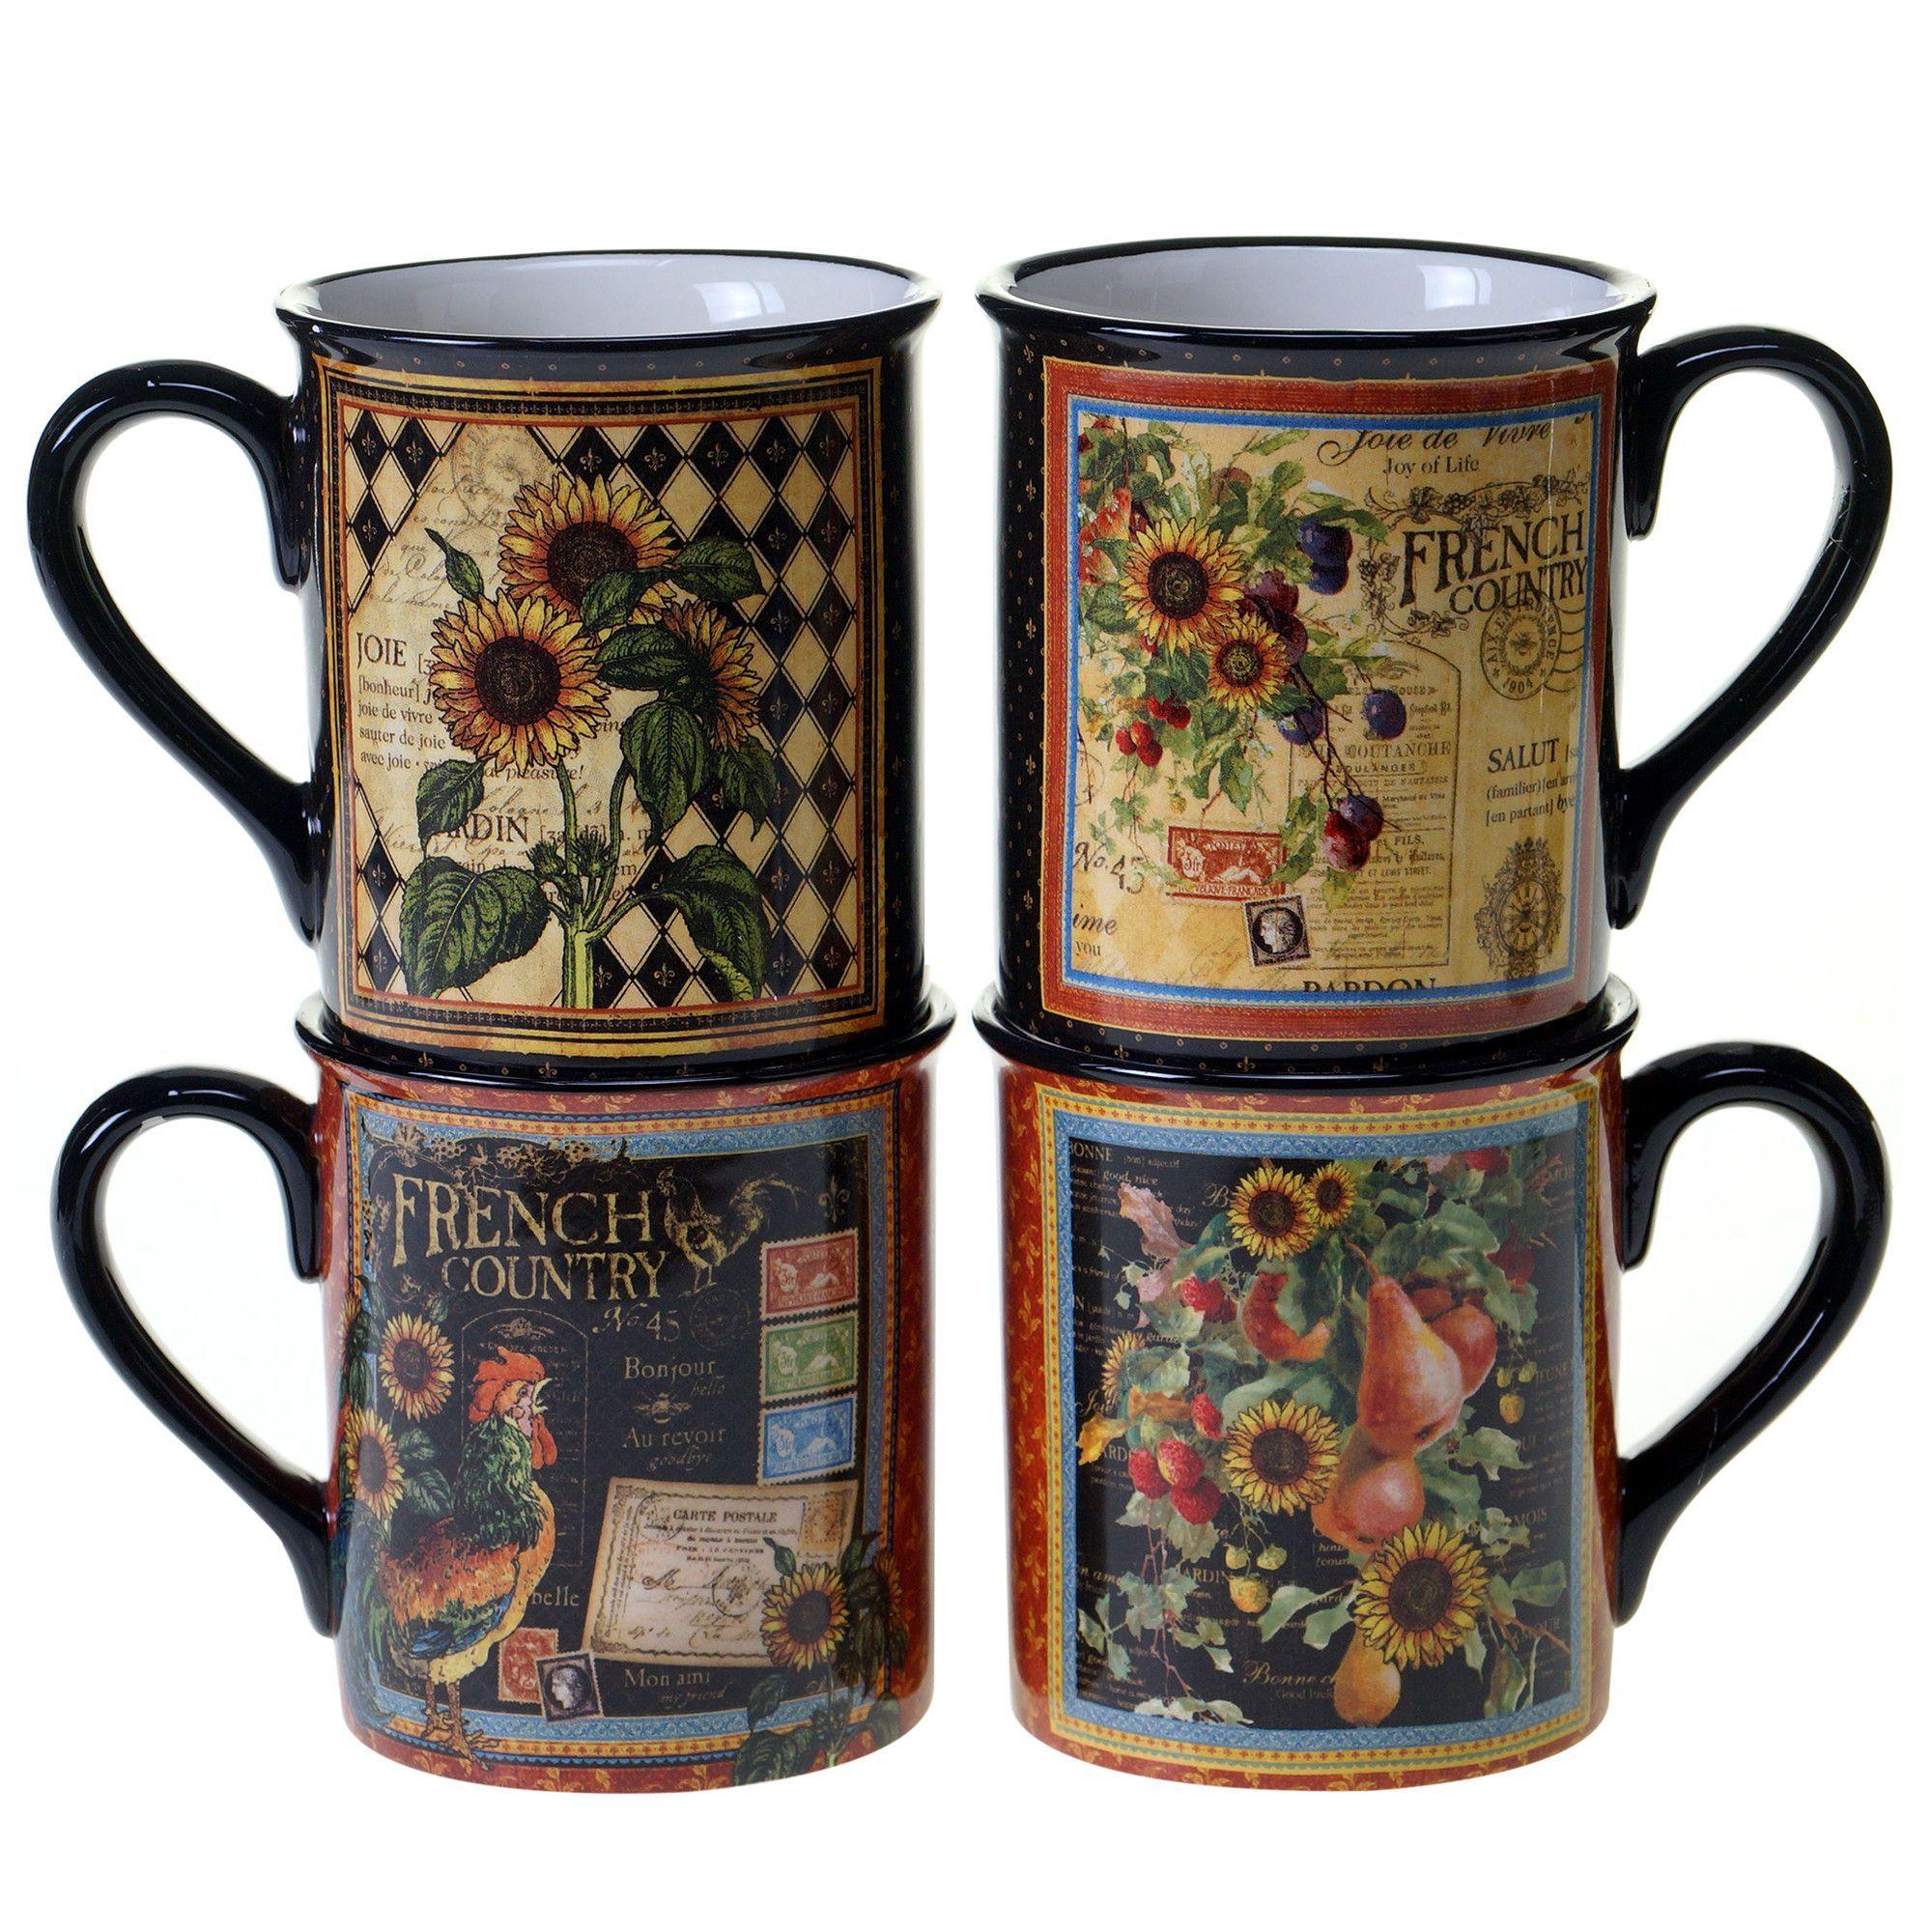 French Country 4 Piece 16 oz. Mug Set Mugs, Mugs set